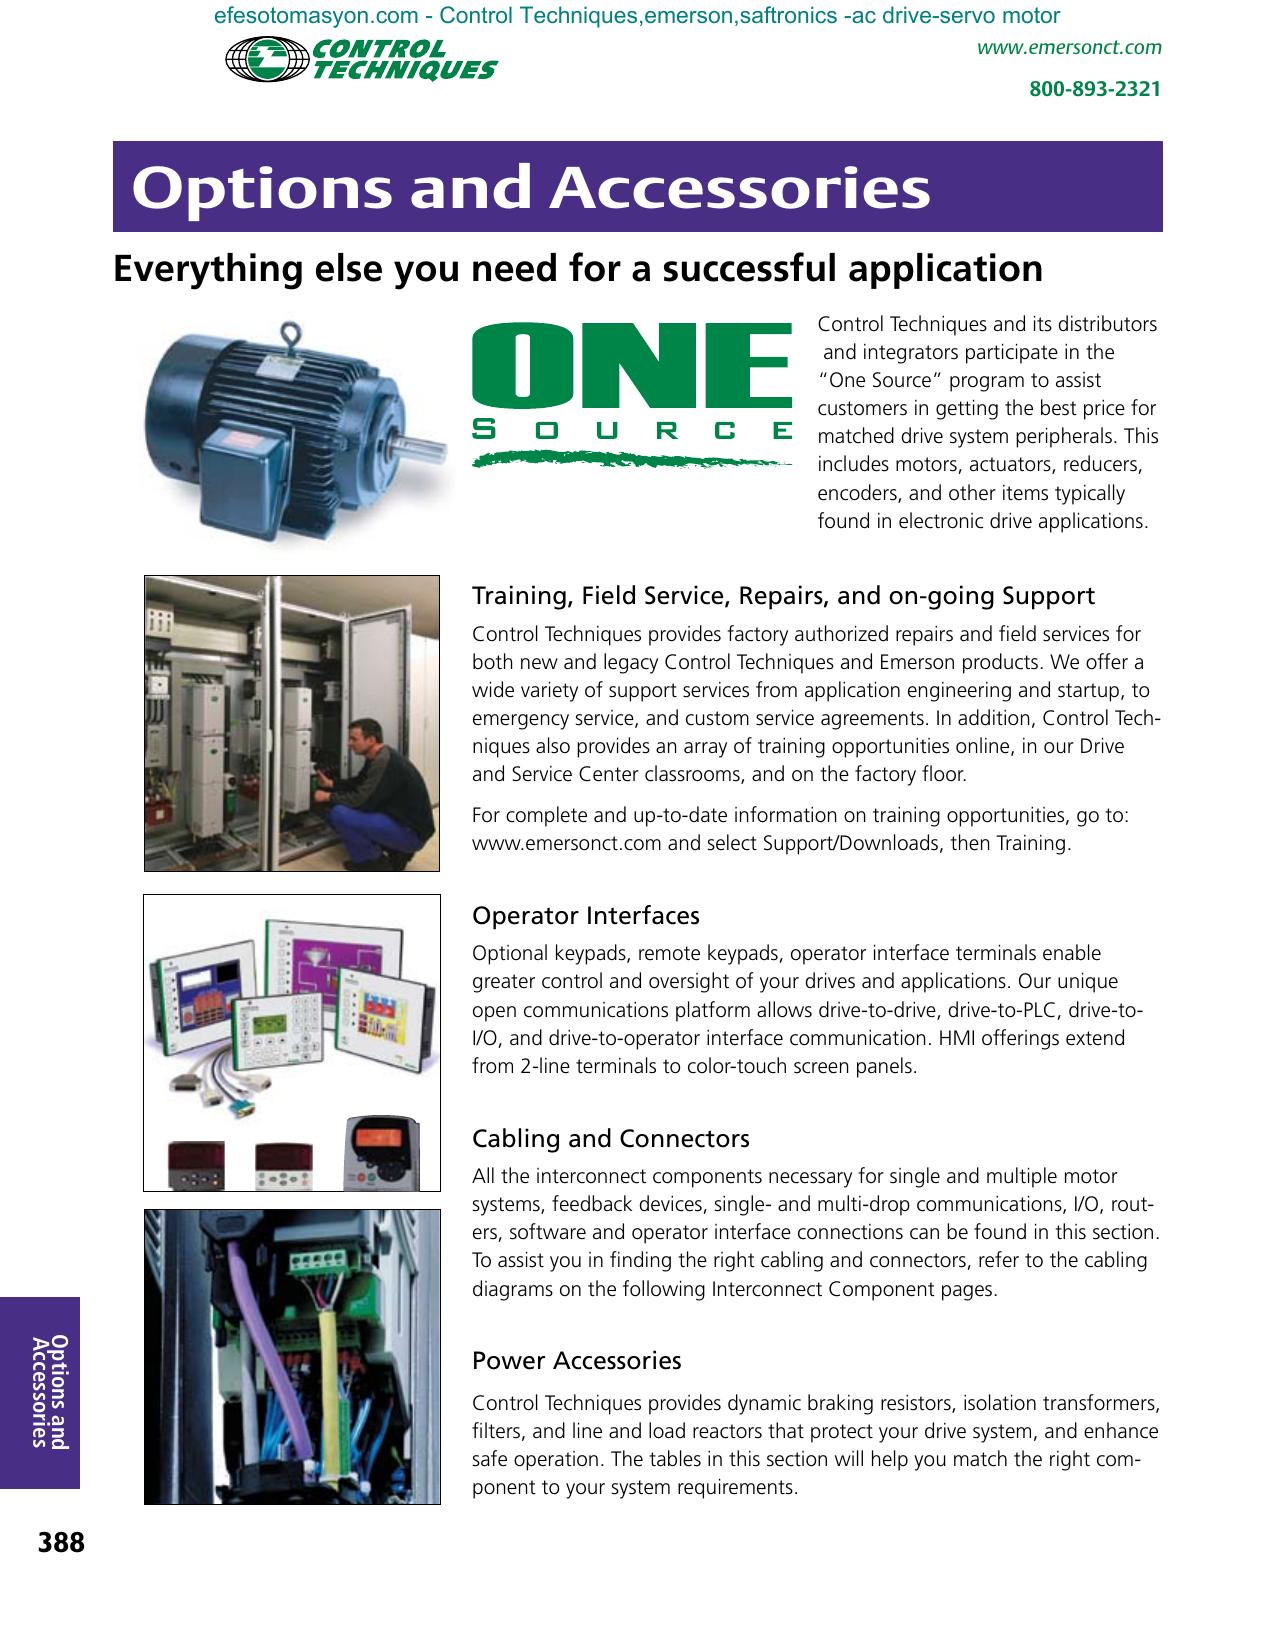 Options and Accessories | manualzz com